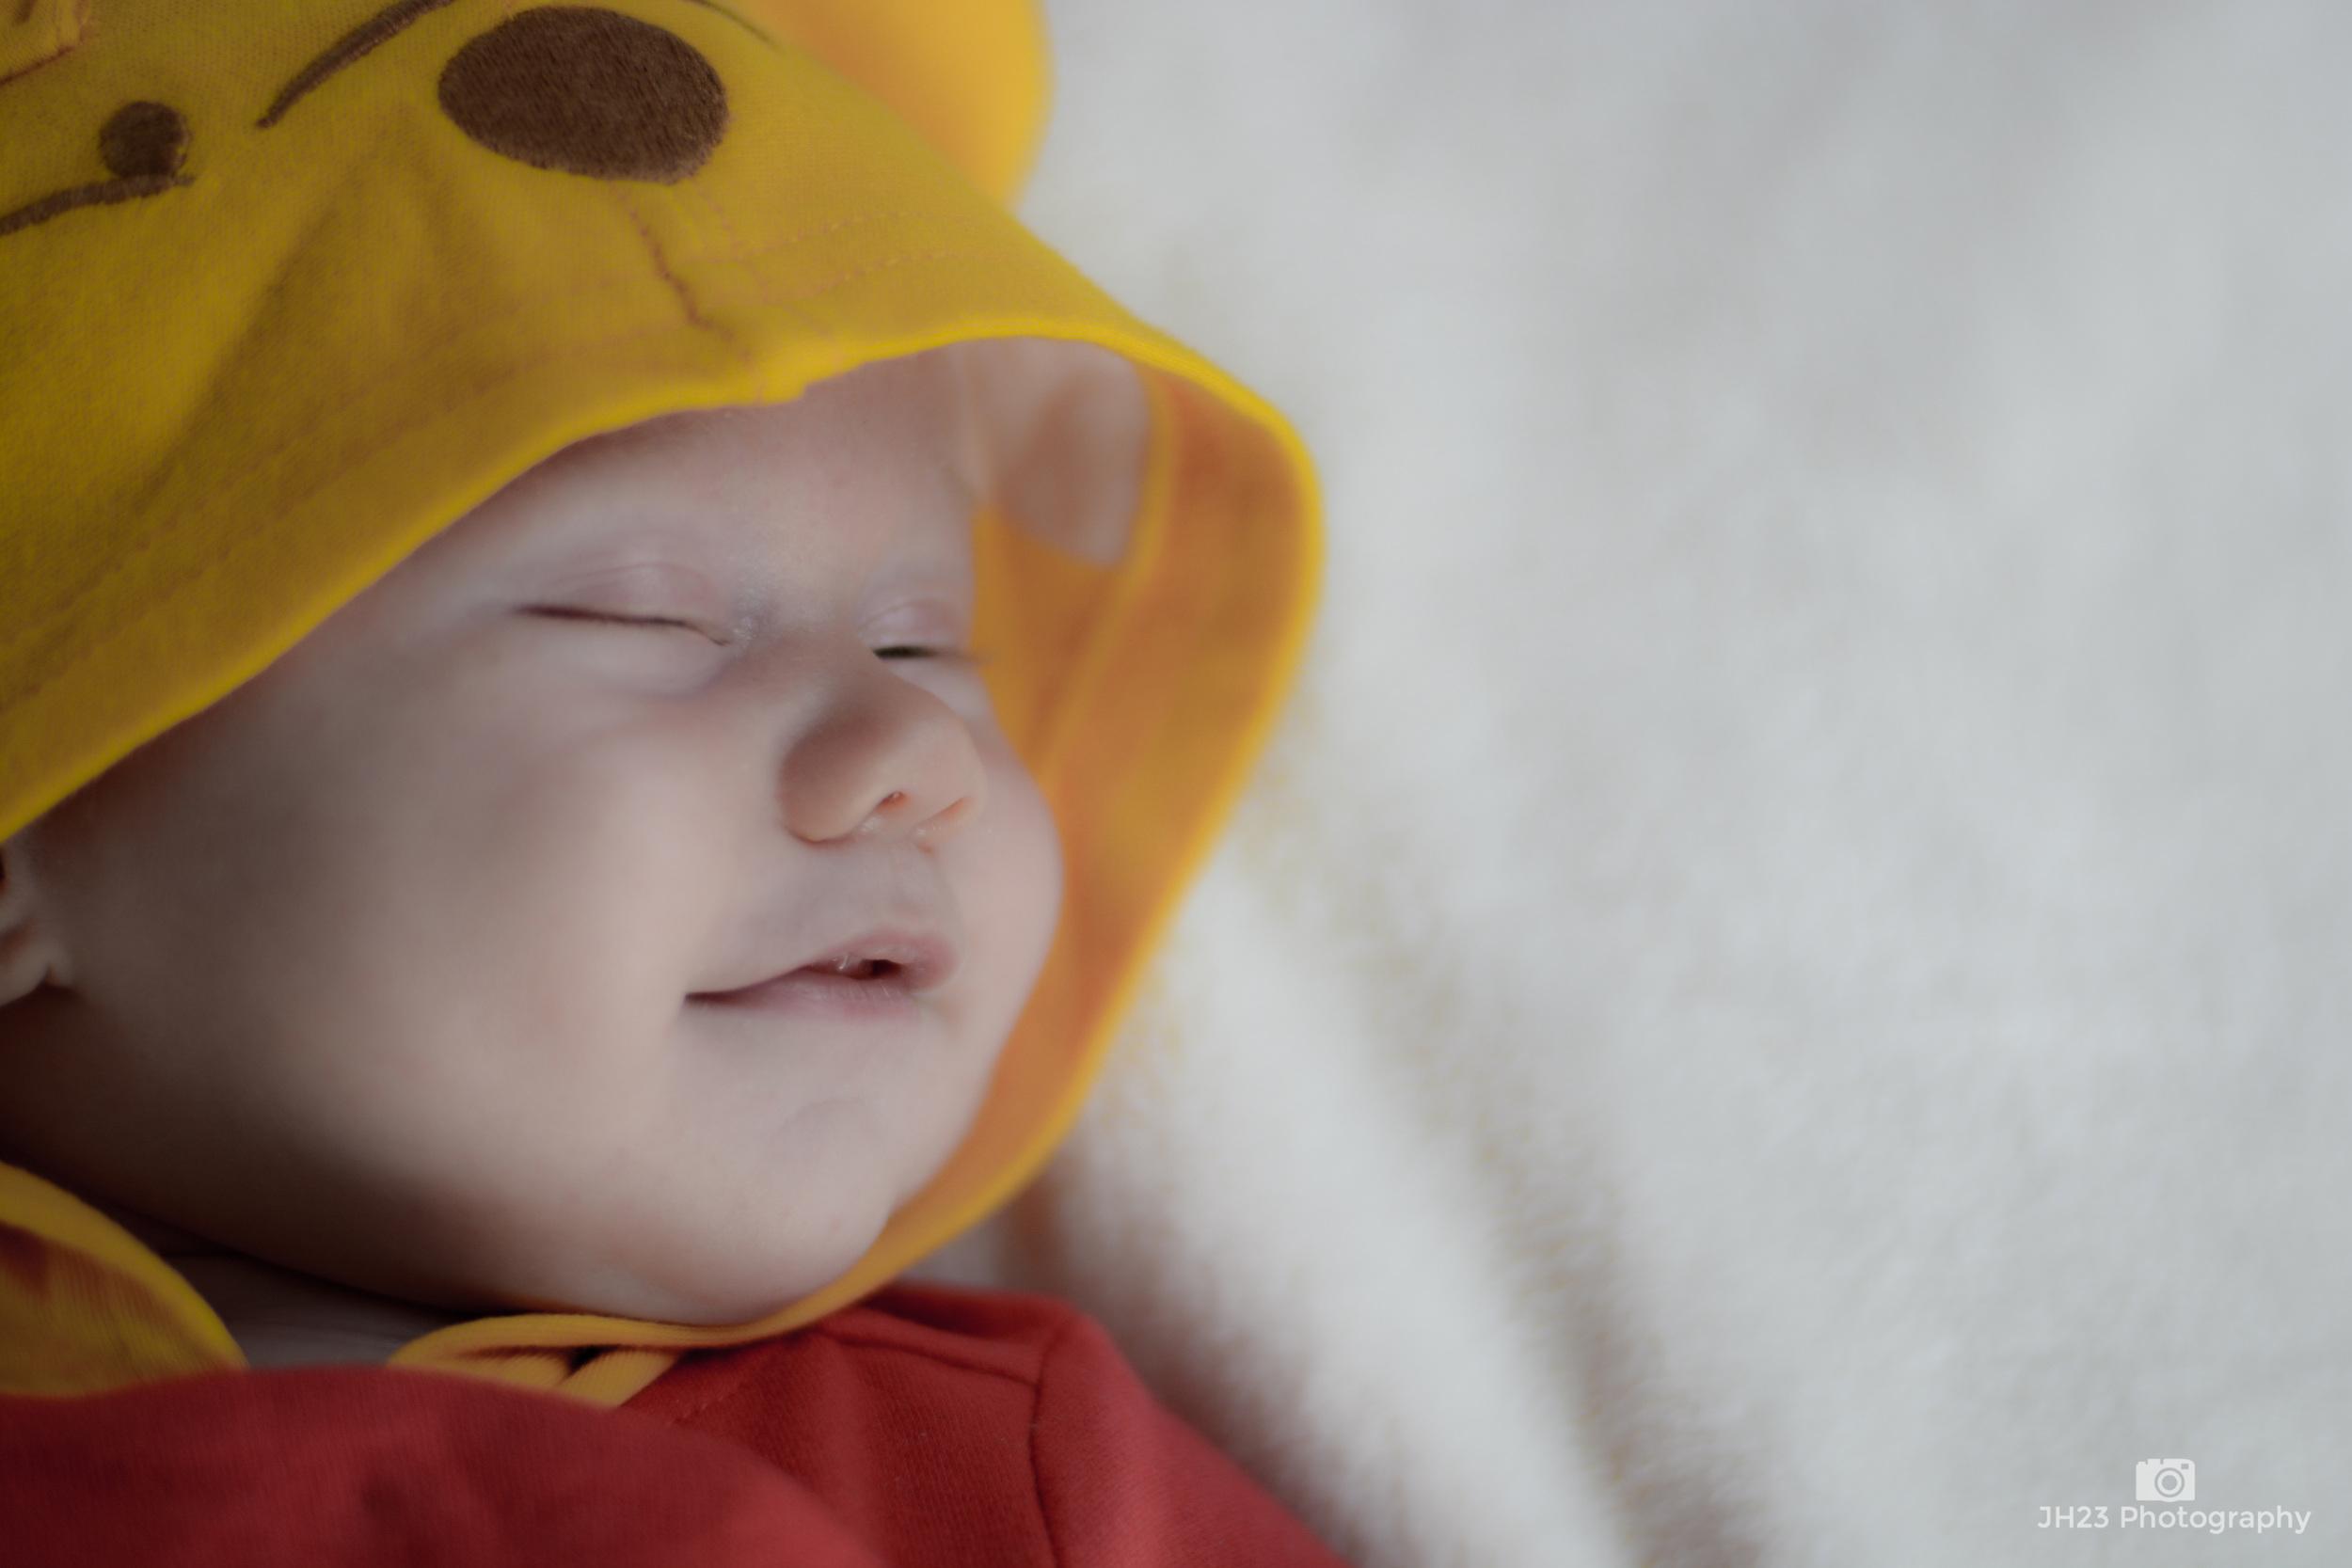 JH23 Photography Newborn Baby